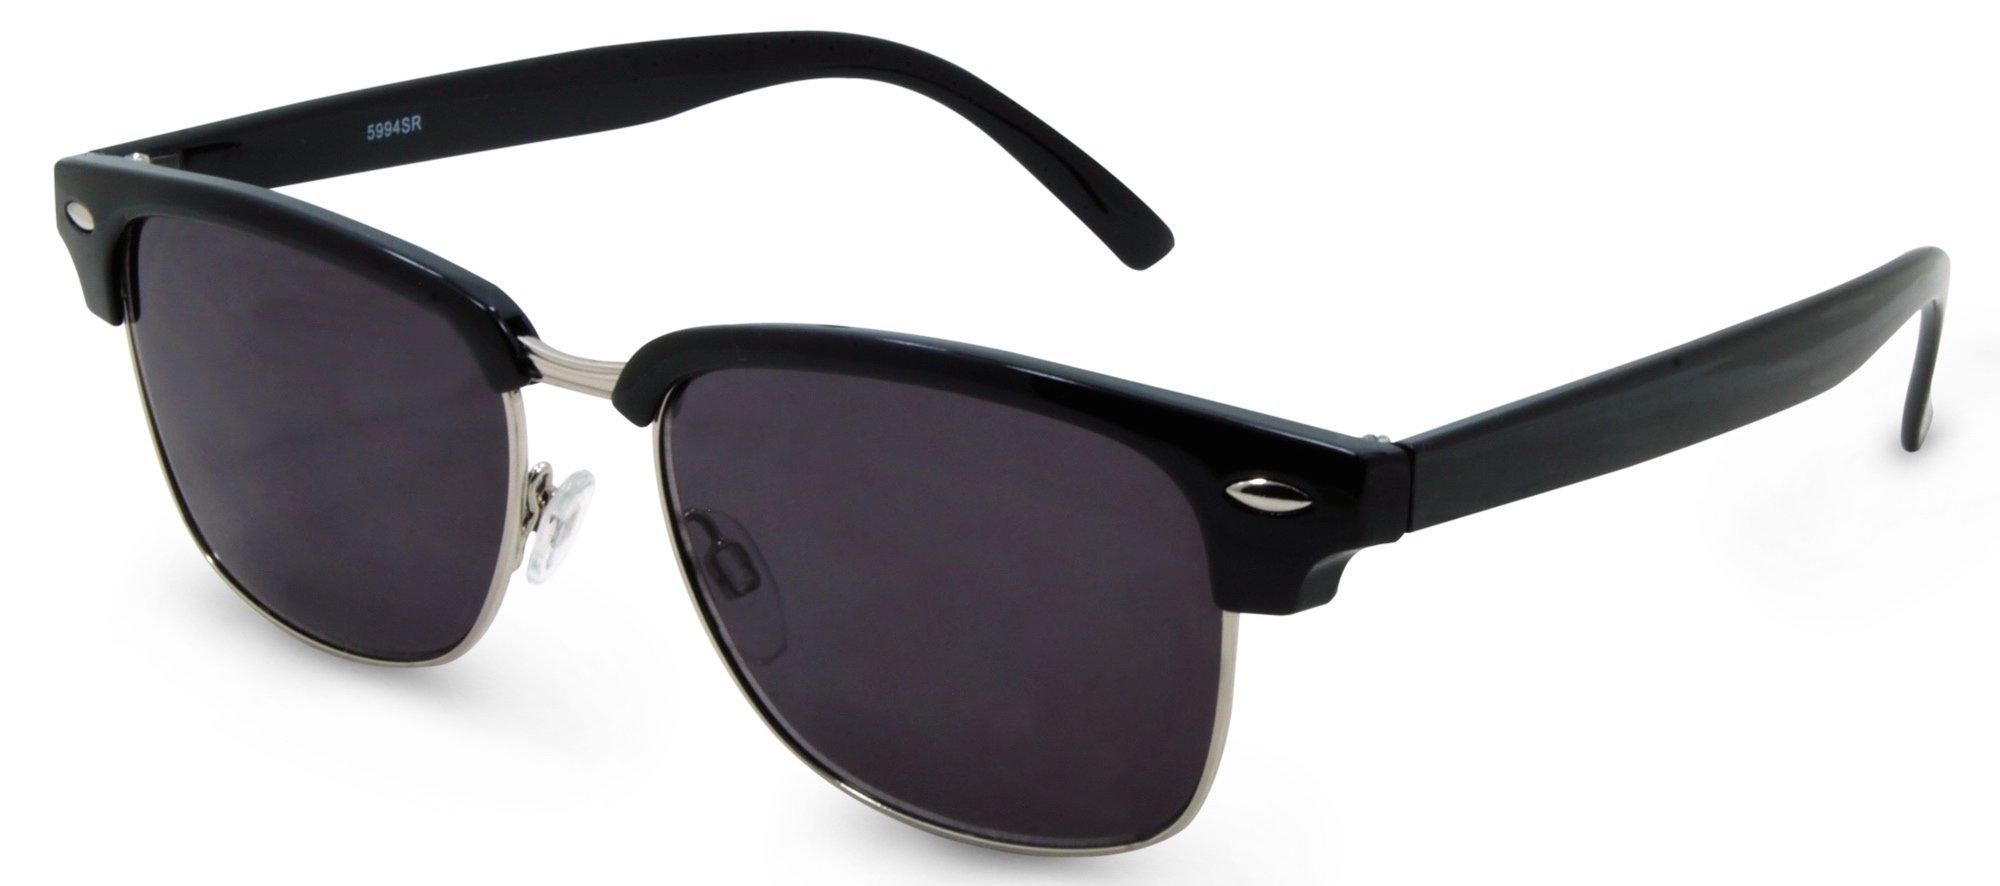 San Francisco Full Sunreaders (Black, 1.50) by MK Eyeglasses